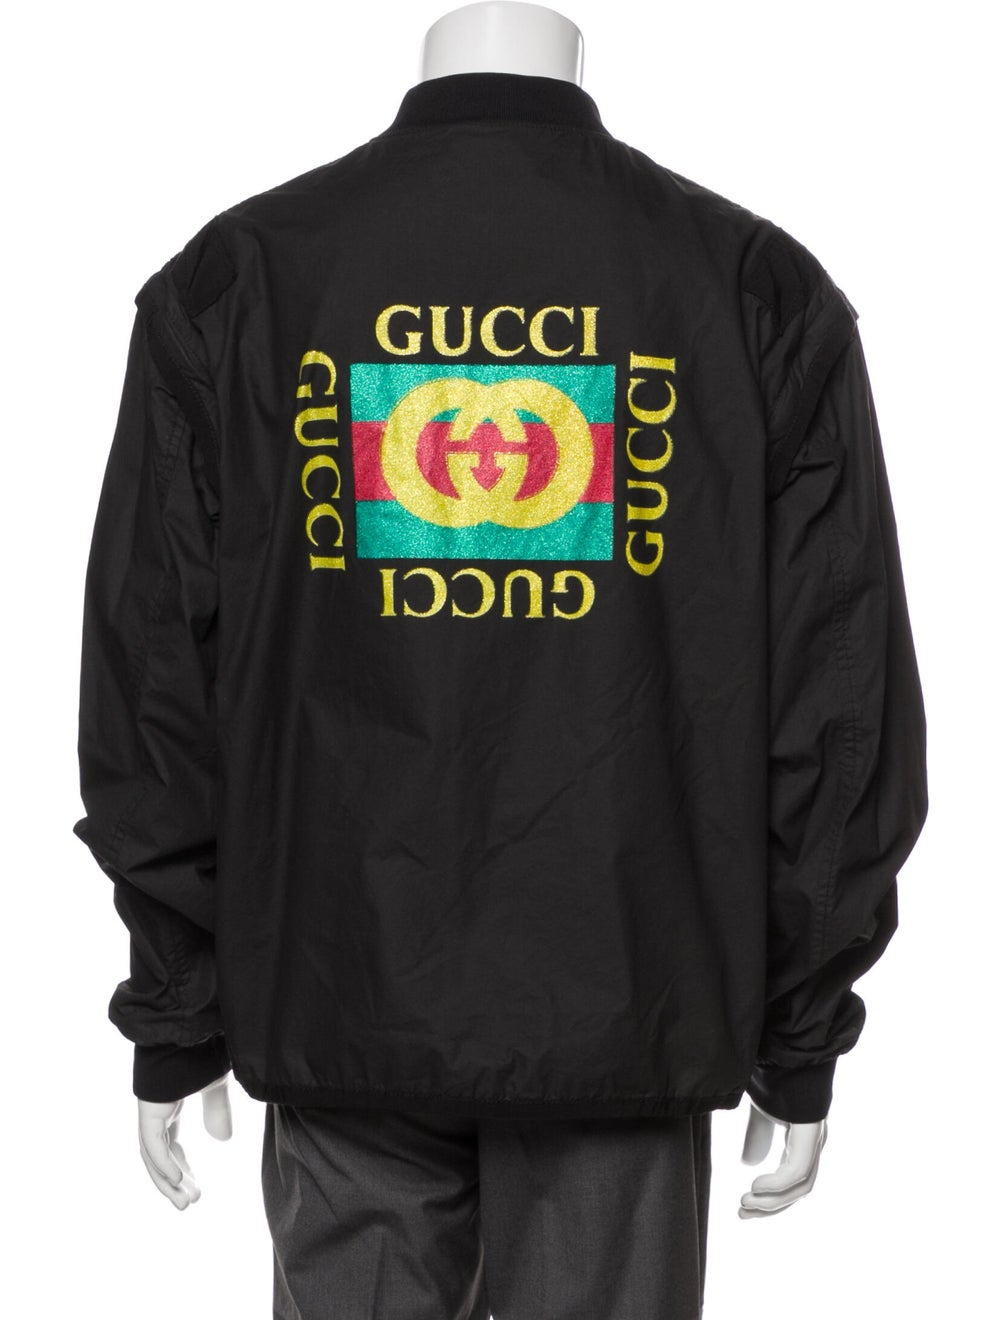 Gucci 2019 Bomber Jacket Black - image 3